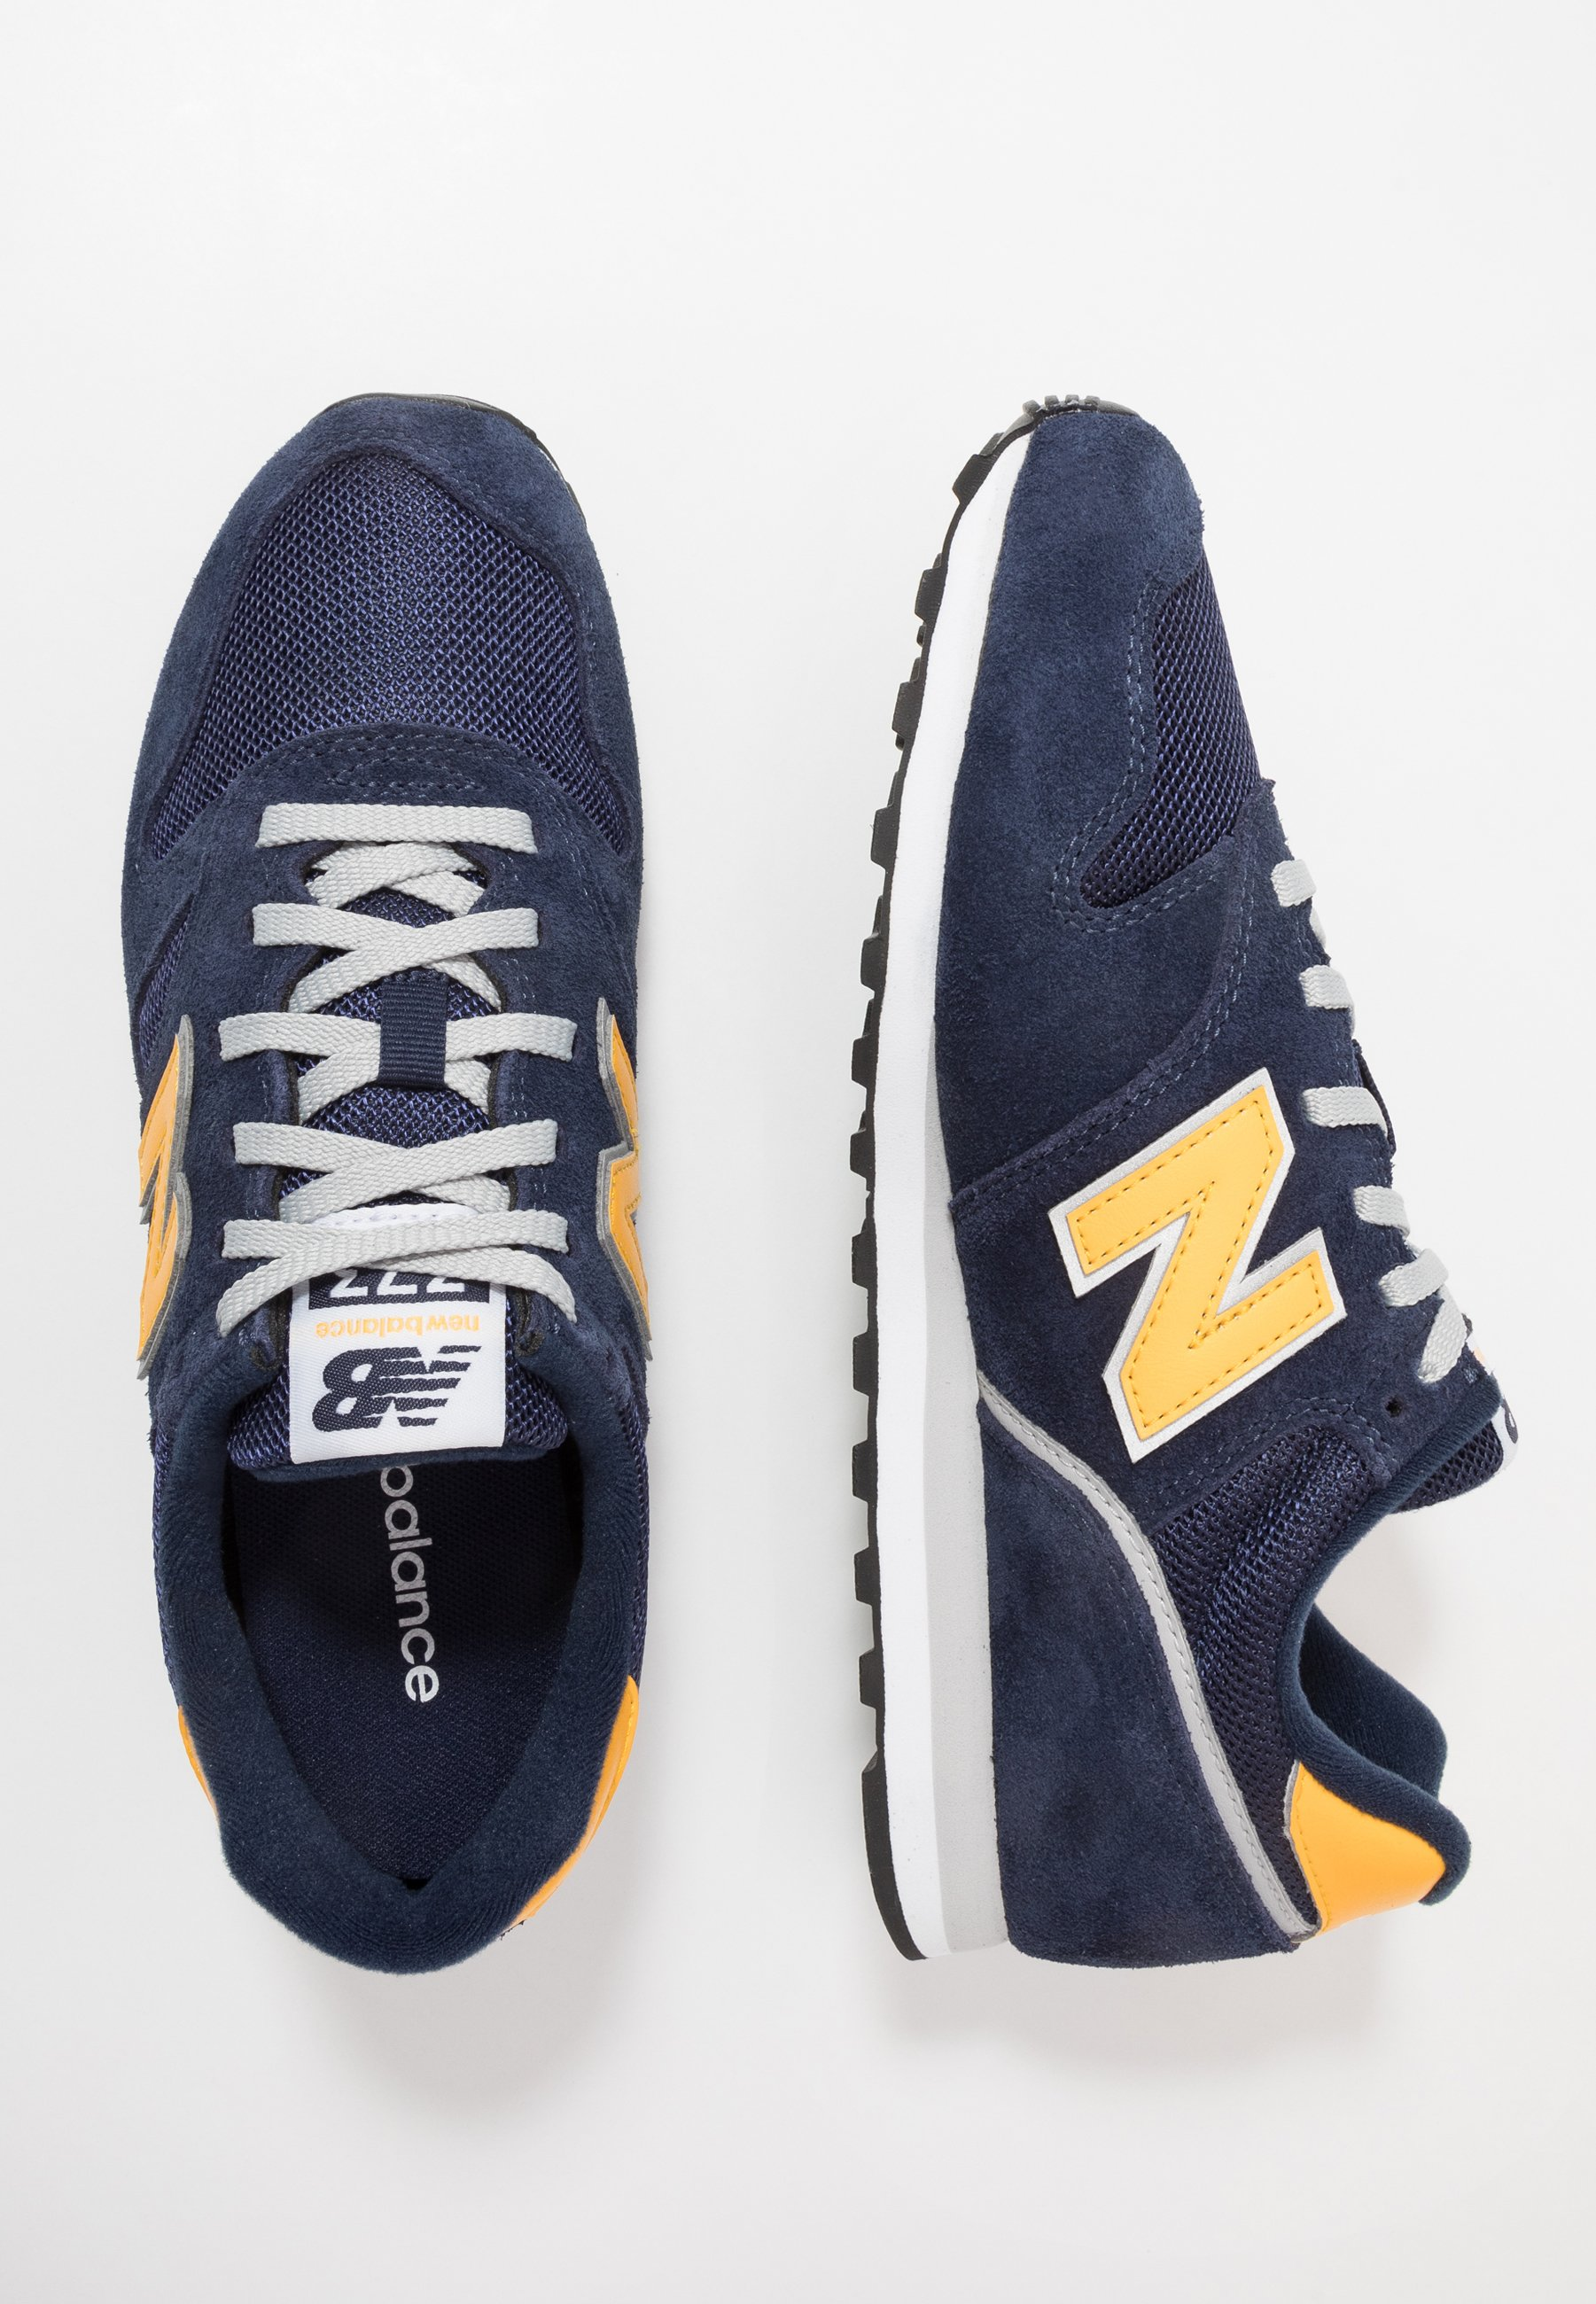 New Balance 373 - Trainers - blue/yellow/dark blue - Zalando.co.uk